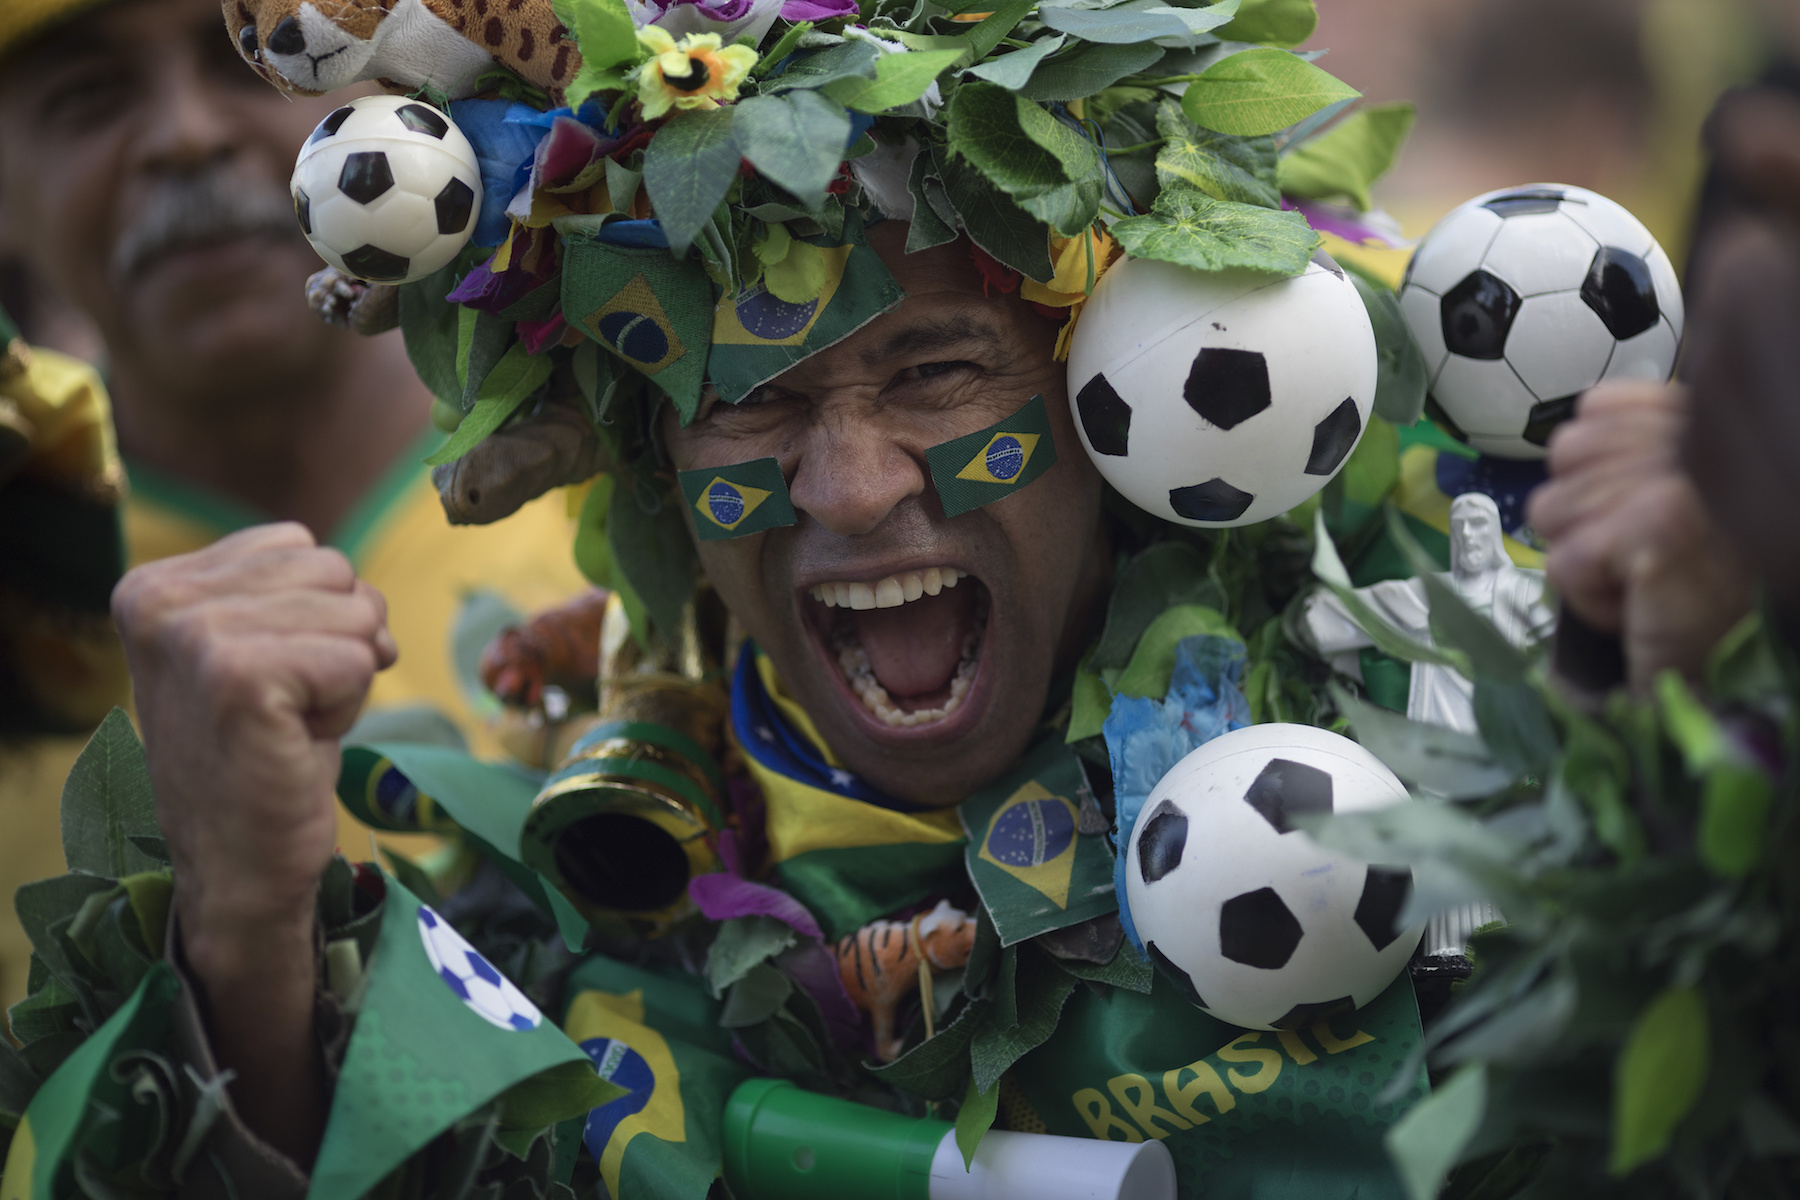 <div class='meta'><div class='origin-logo' data-origin='AP'></div><span class='caption-text' data-credit='AP Photo/Leo Correa'>A Brazil soccer fan, in a costume, poses to the camera as he cheers before his team's World Cup match against Switzerland in Rio de Janeiro, Brazil, Sunday, June 17, 2018.</span></div>